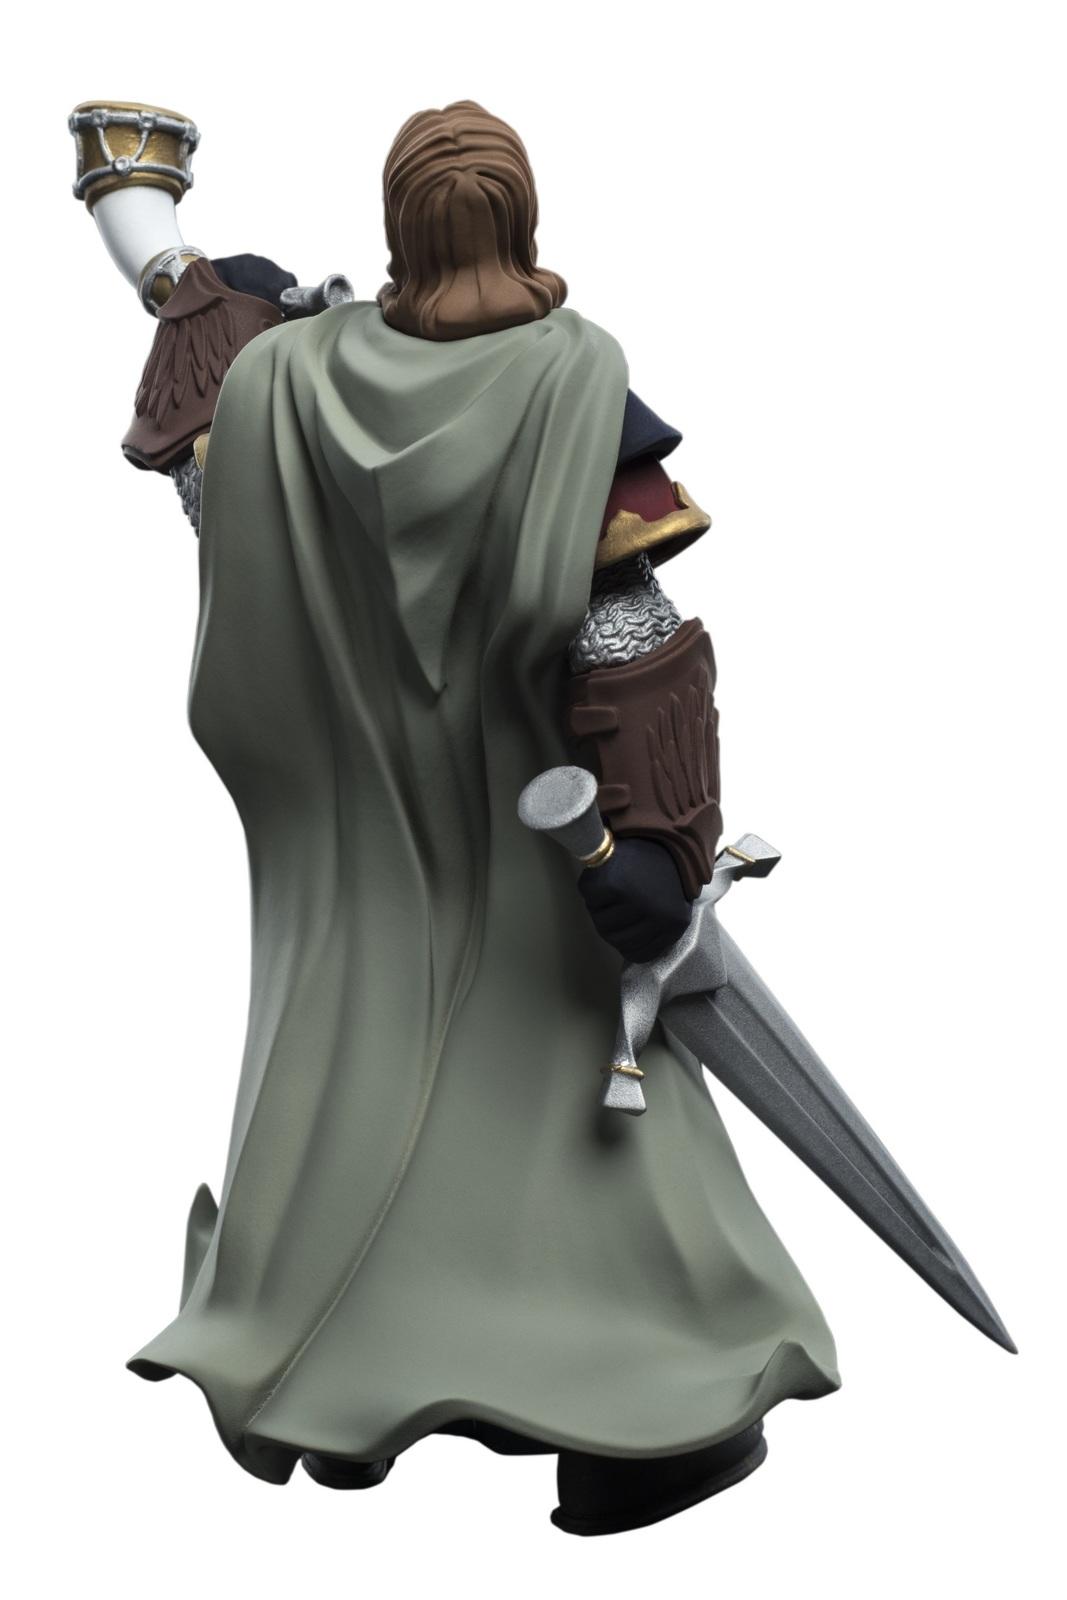 The Lord of the Rings: Mini Epics - Boromir image